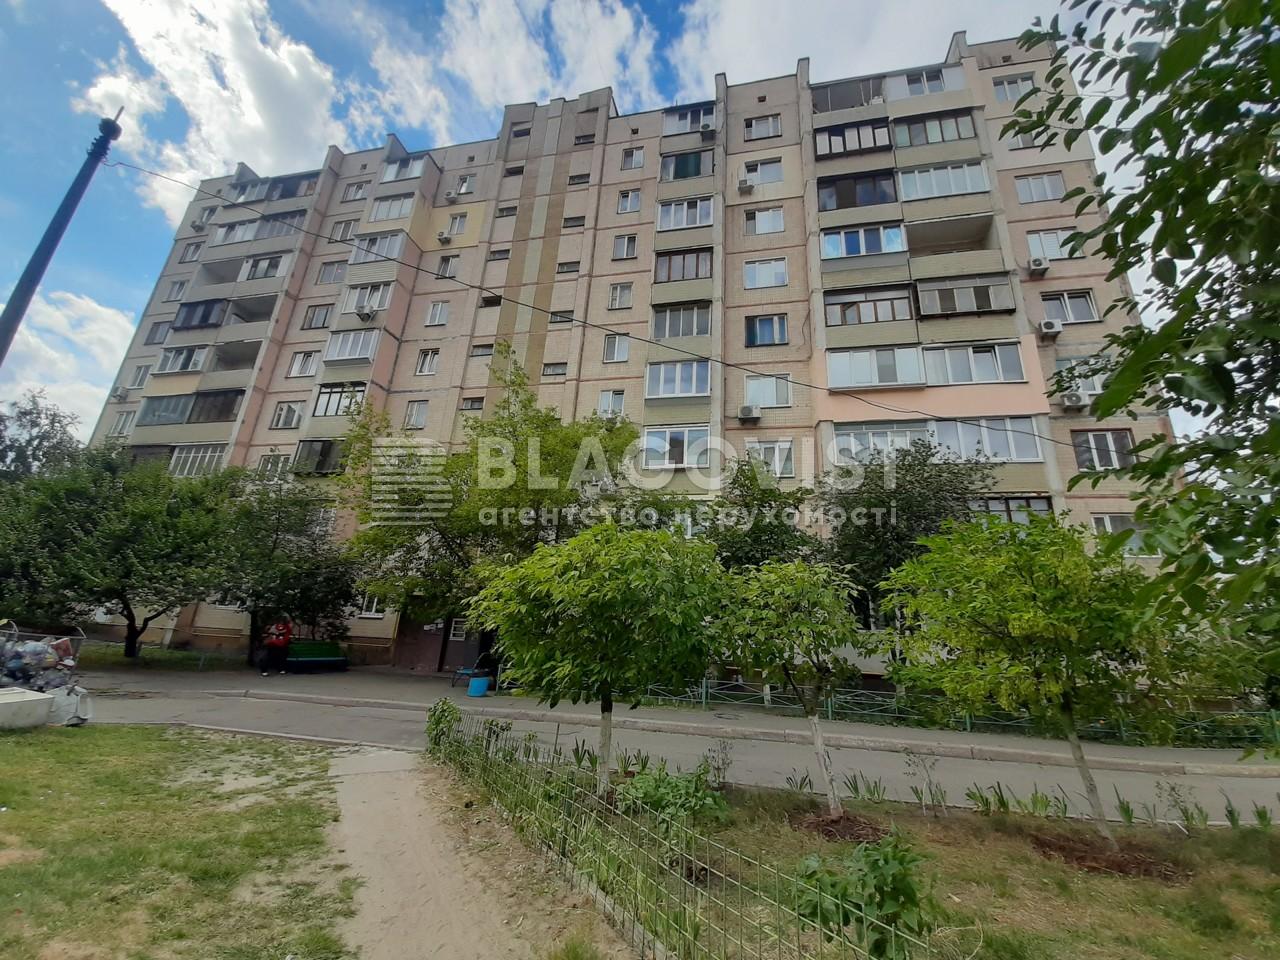 Квартира R-40332, Григоренко Петра просп., 25б, Киев - Фото 11